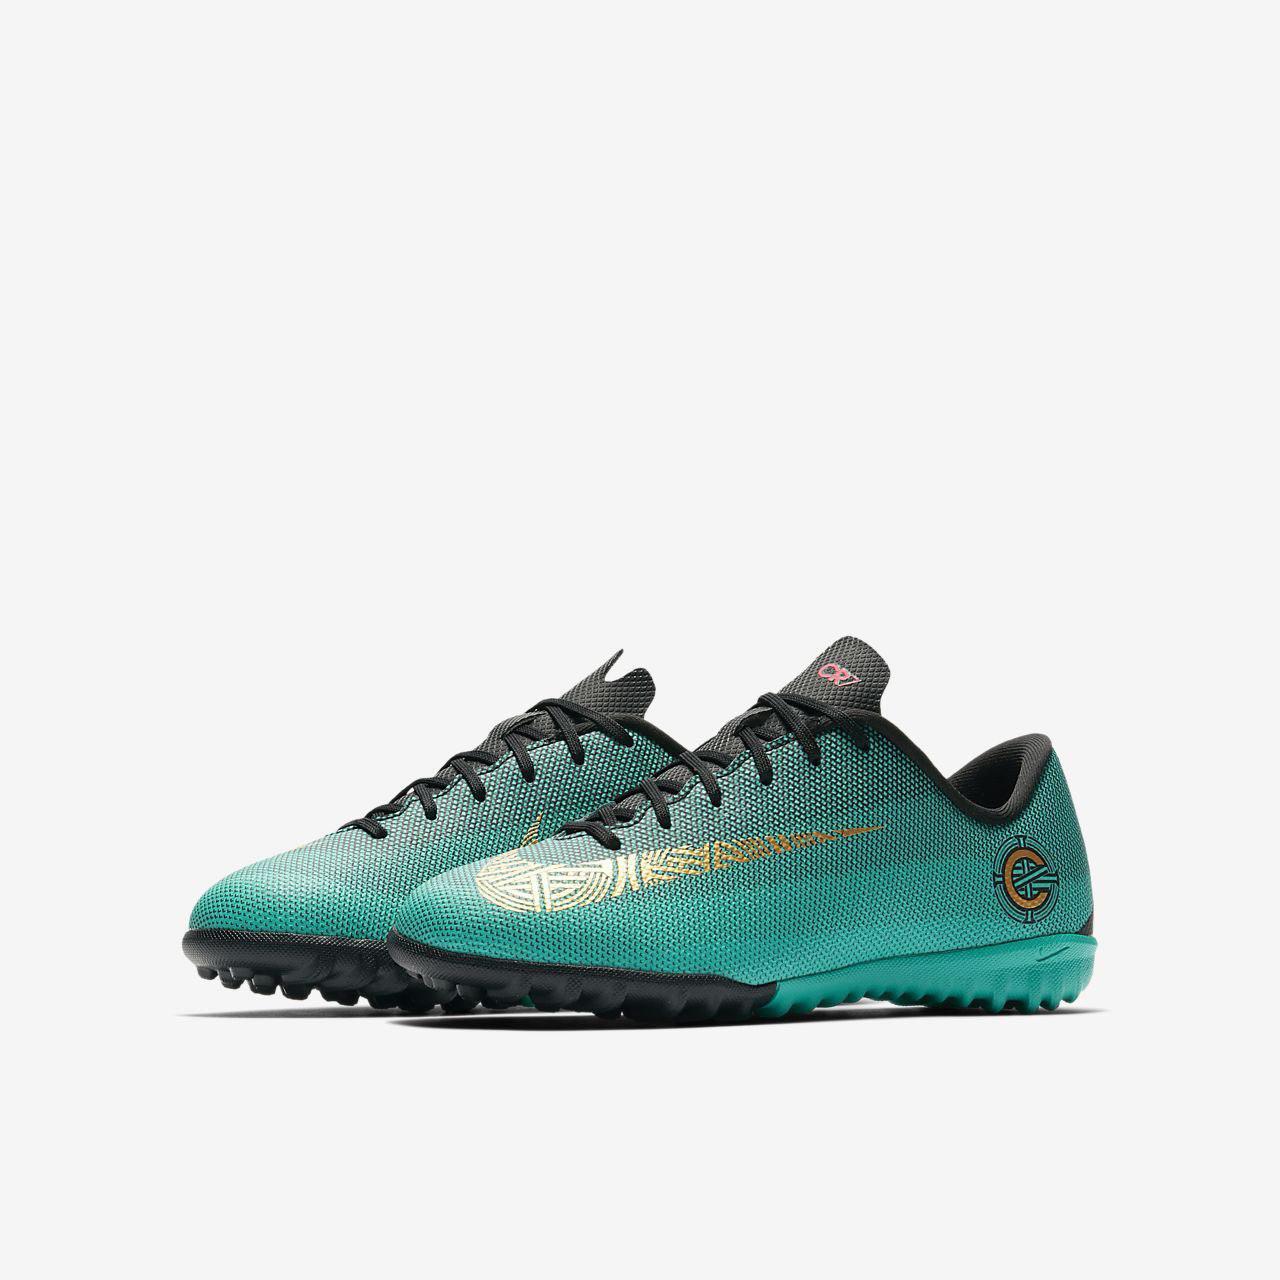 10920ff9d12f ShoesBox - נעלי כטרגל לנוער NIKE JR VAPORX 12 ACADEMY GS CR7 TF ...